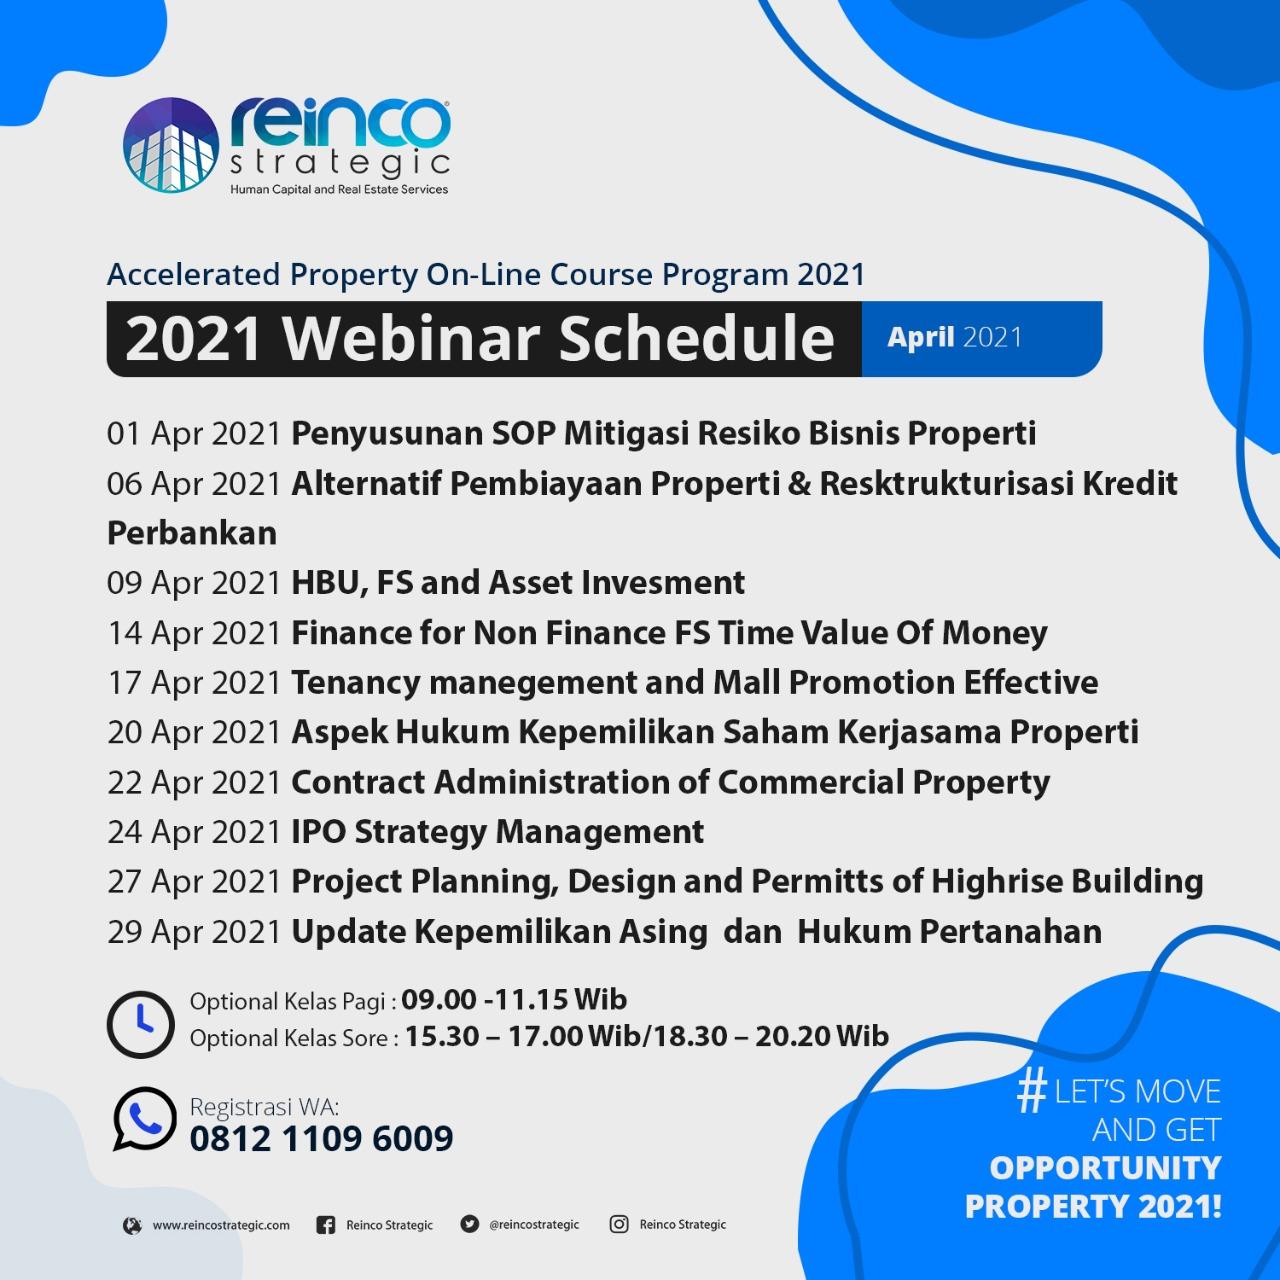 Webinar Schedule April 2021